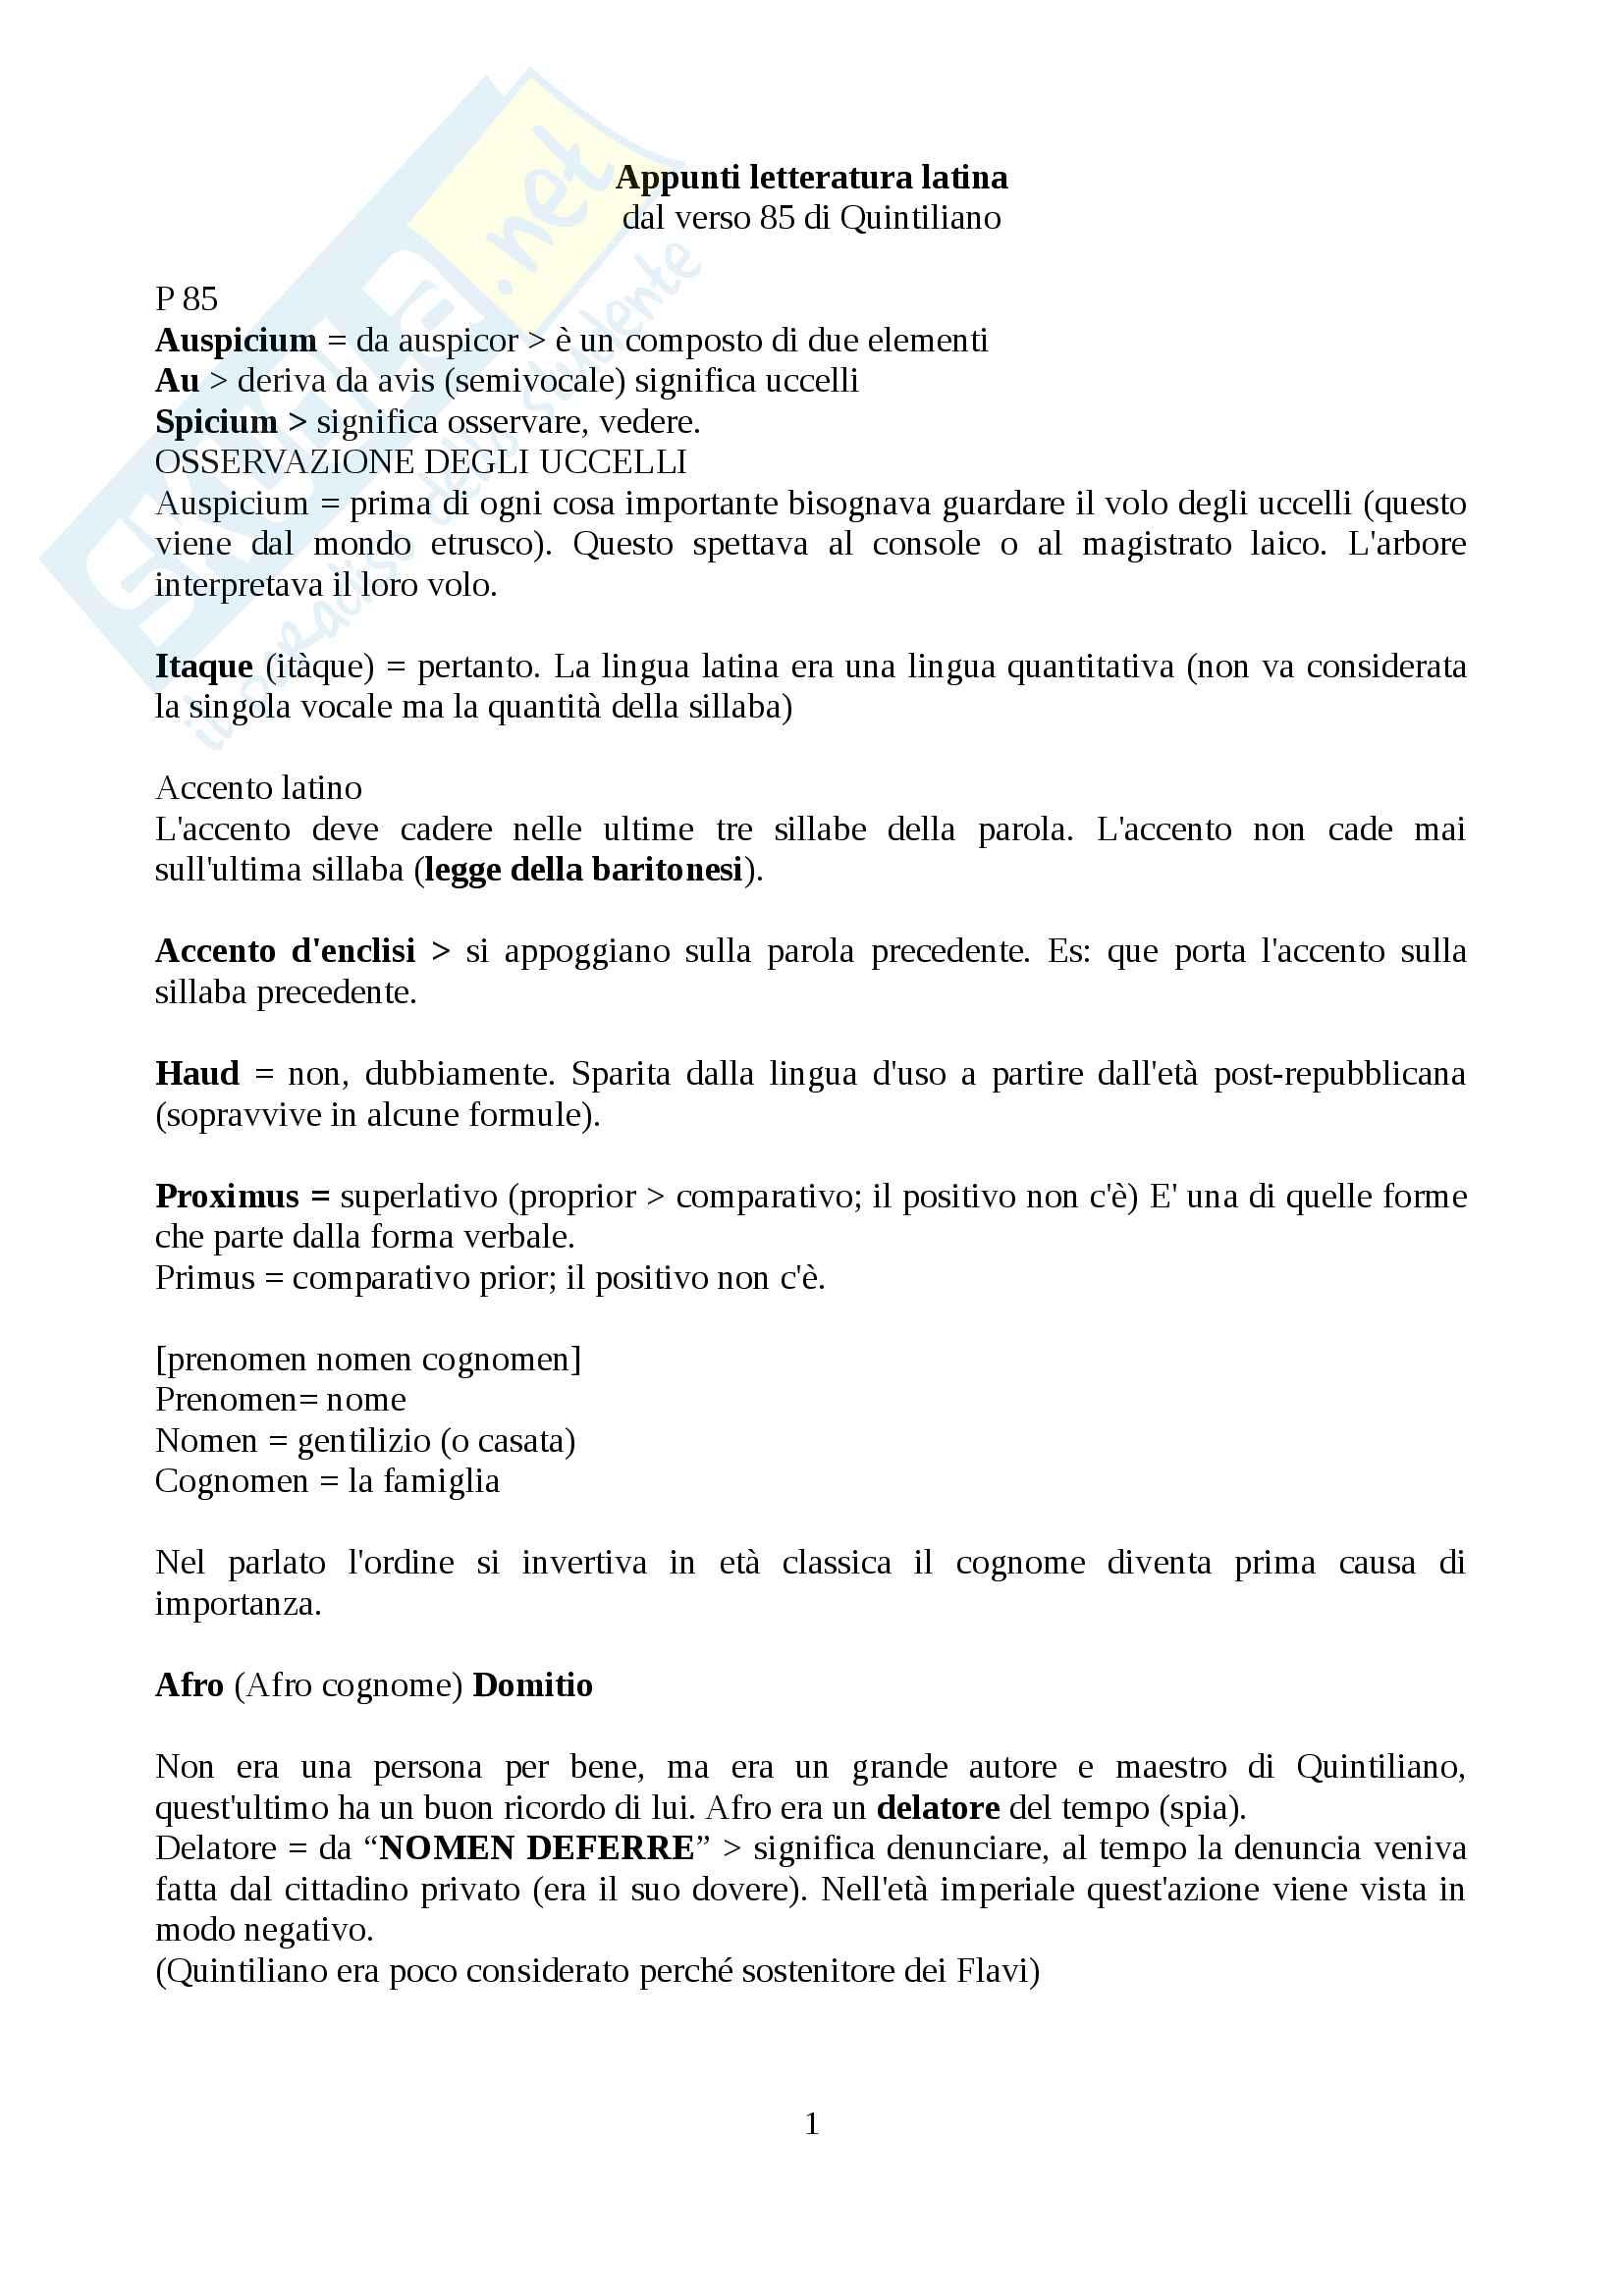 Appunti letteratura latina introduttivo prof. Cavarzere